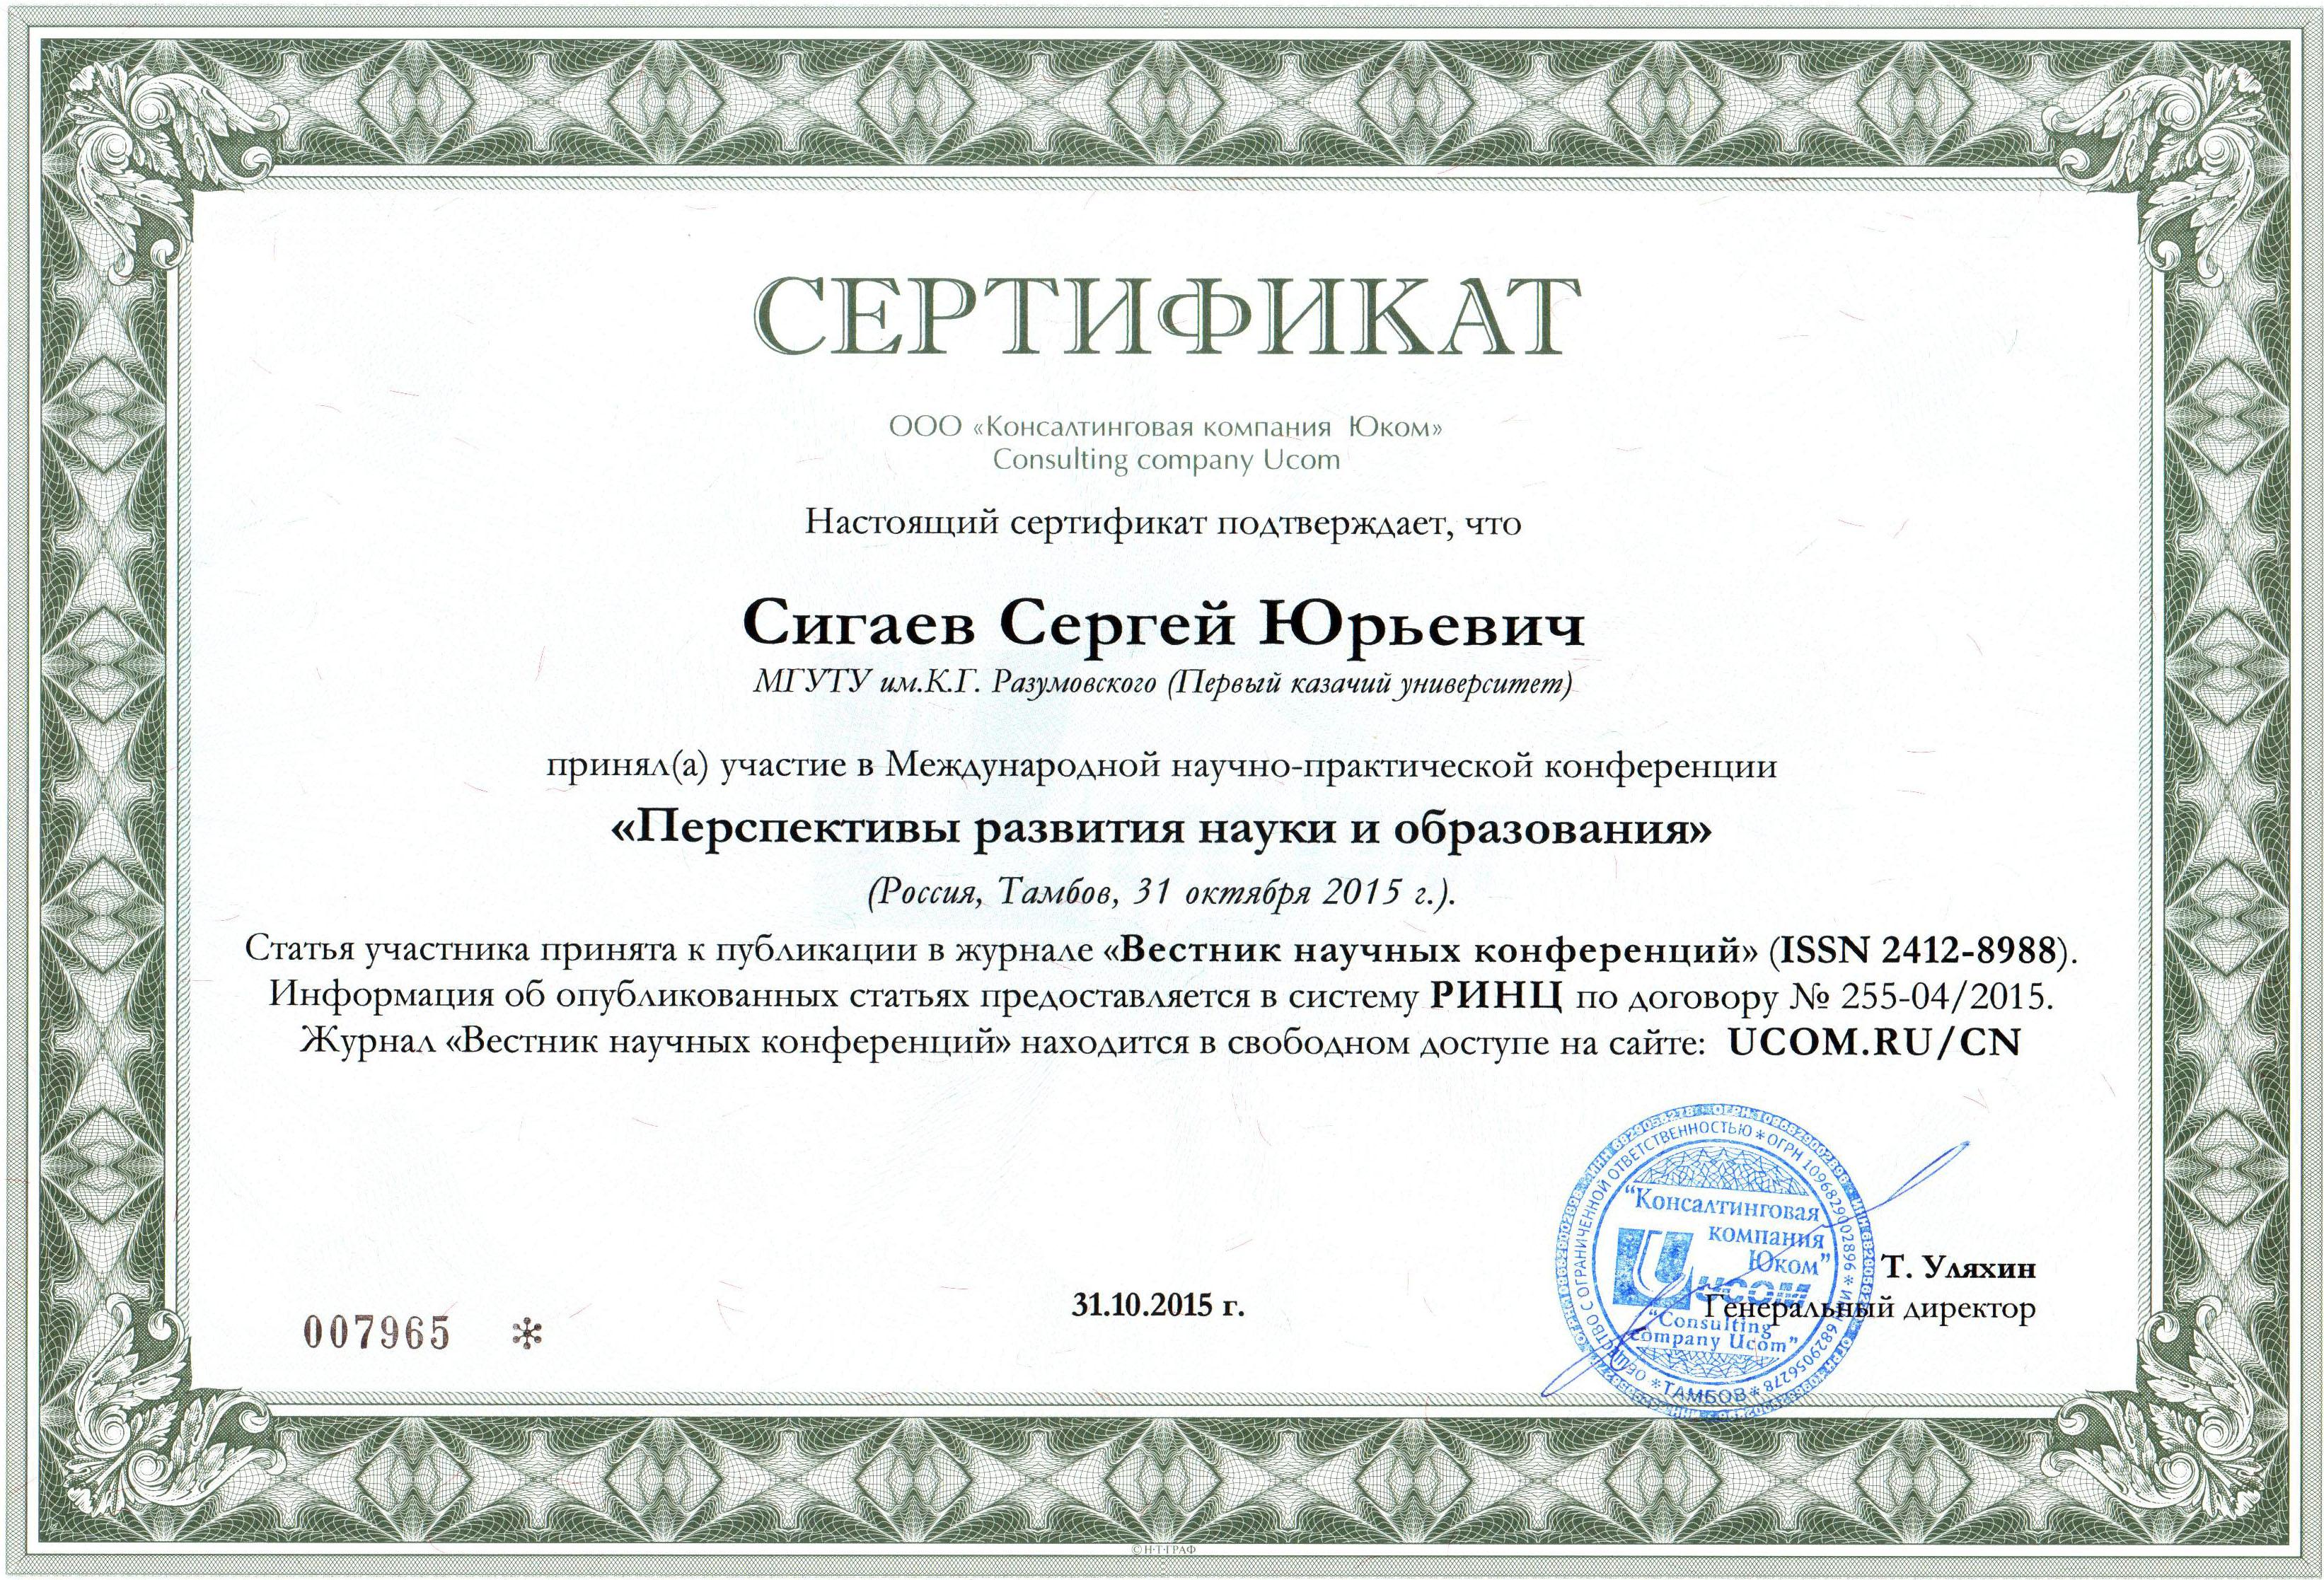 https://img-fotki.yandex.ru/get/3415/17259814.15/0_930a8_dc52459e_orig